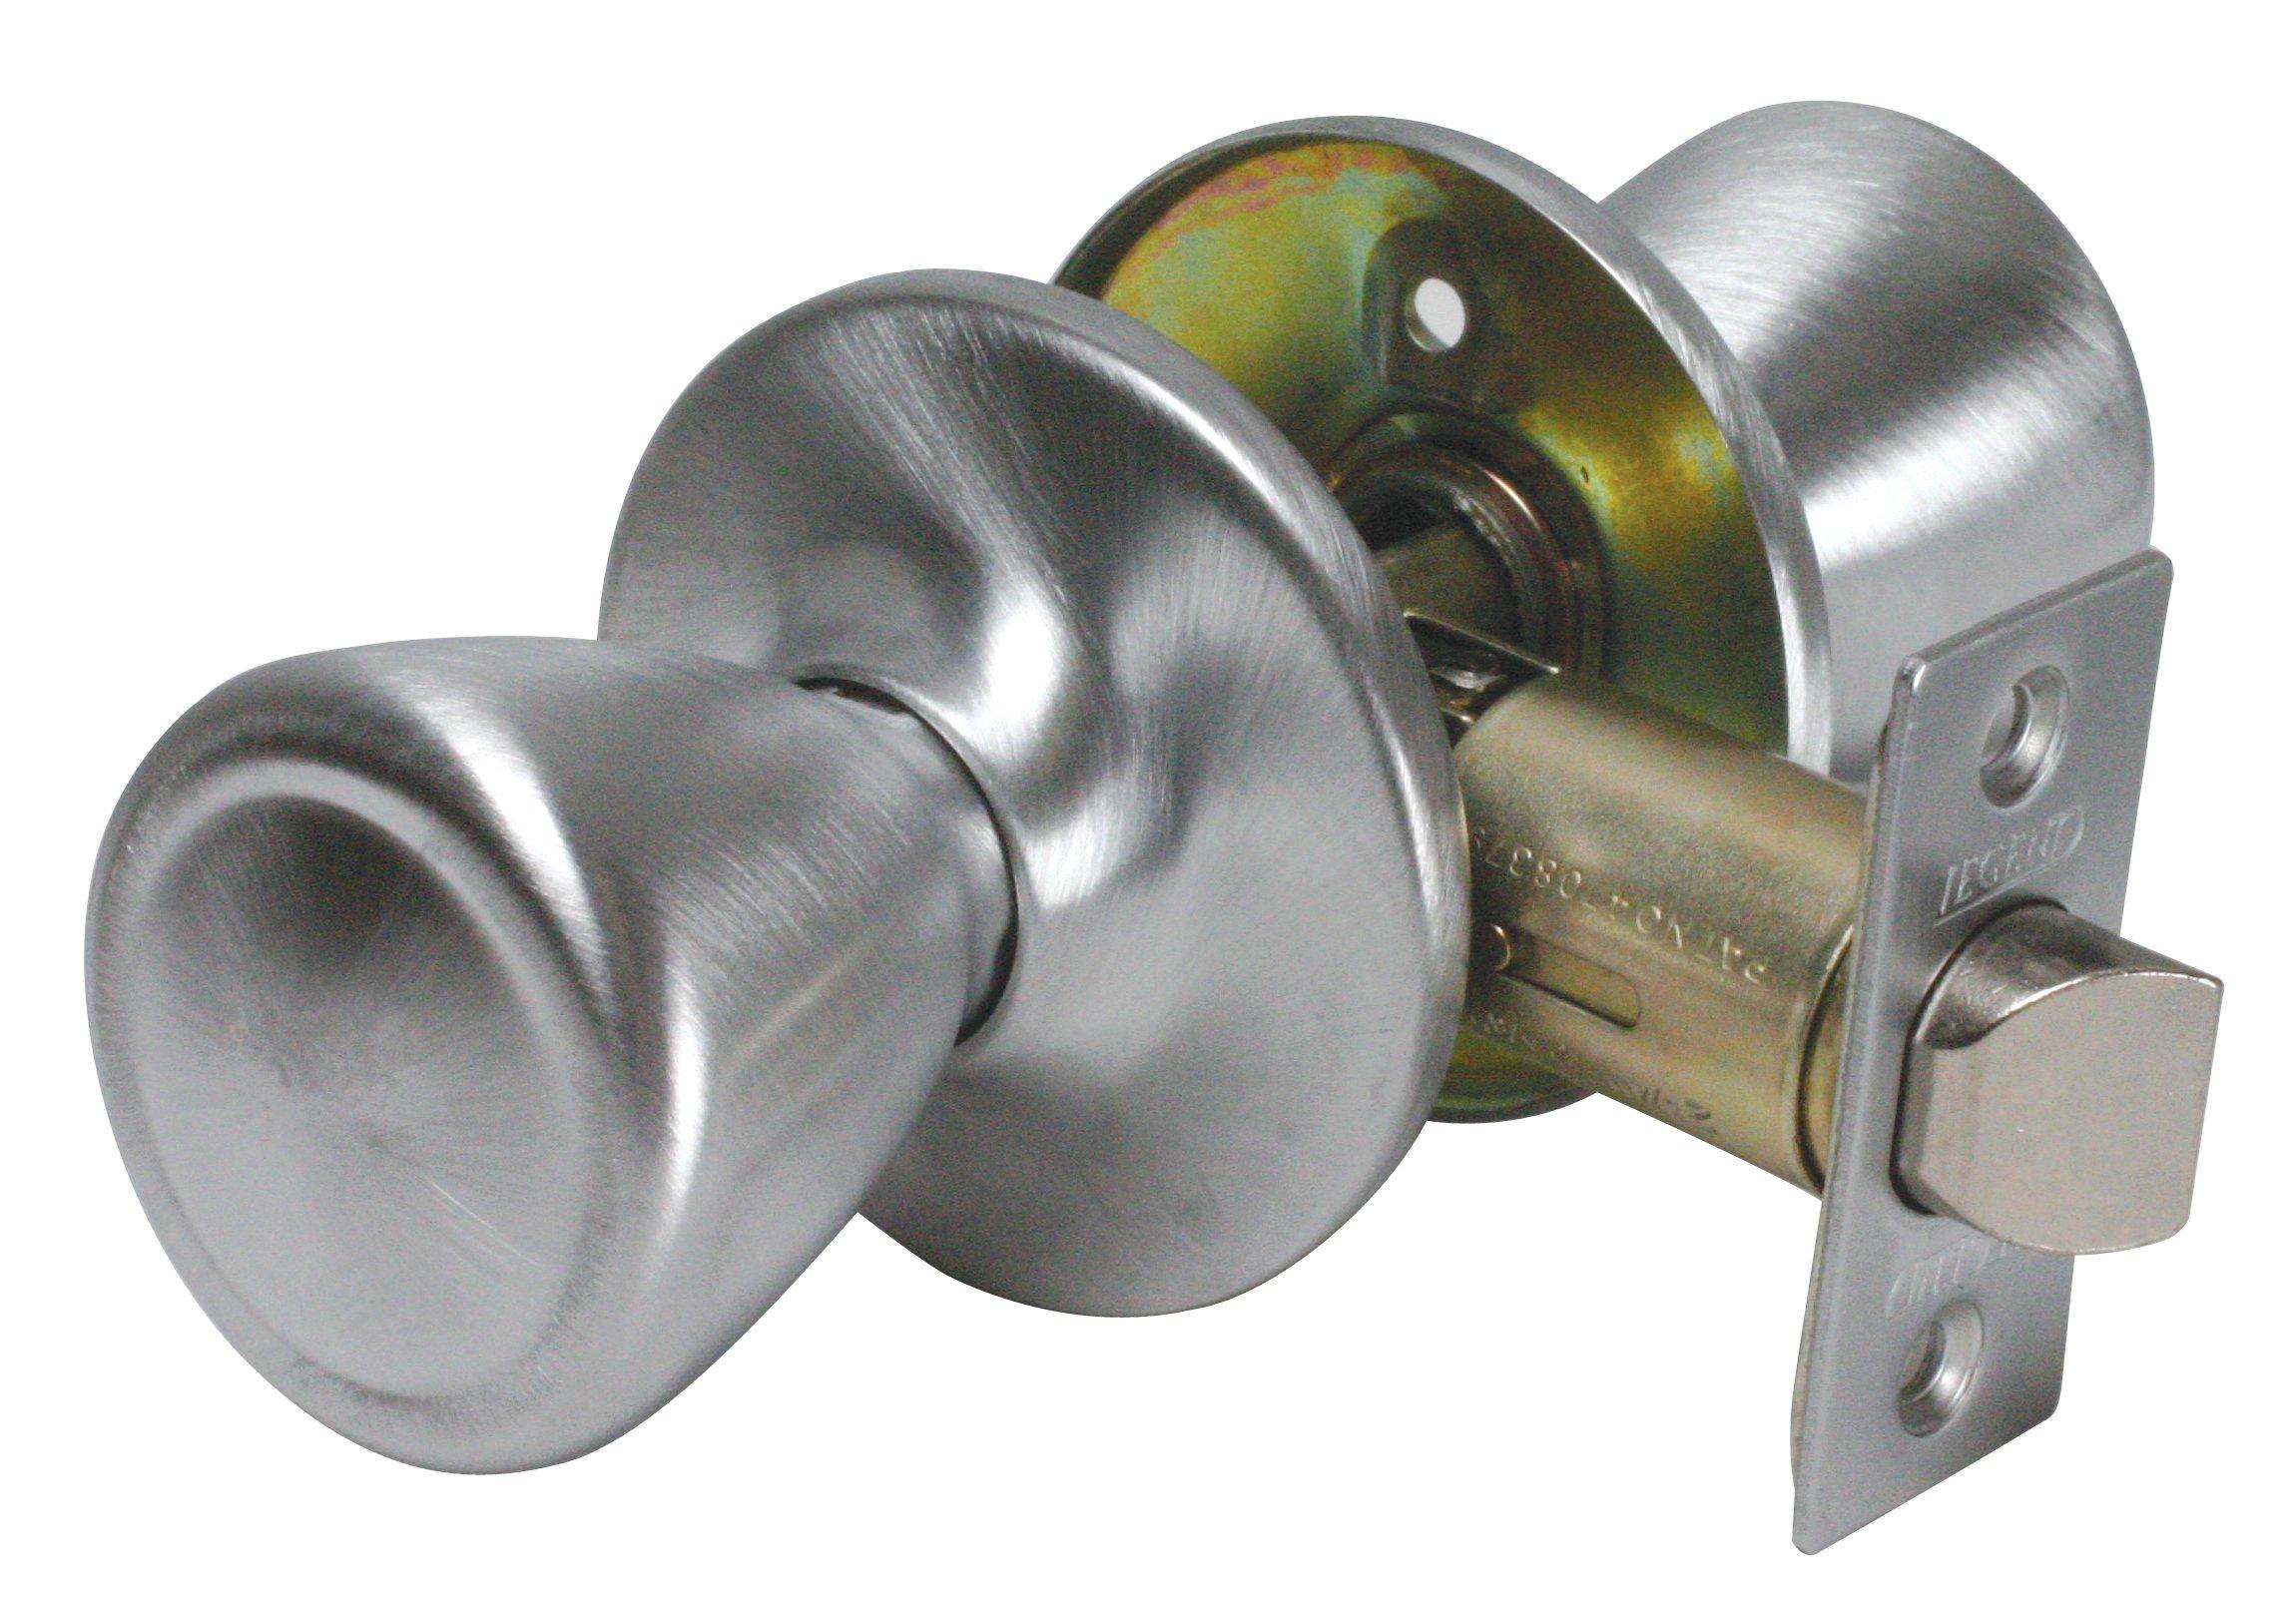 Legend 809027 Tulip Style Door Knob Hall and Closet Passage Lockset, US27 Brushed Aluminum Finish